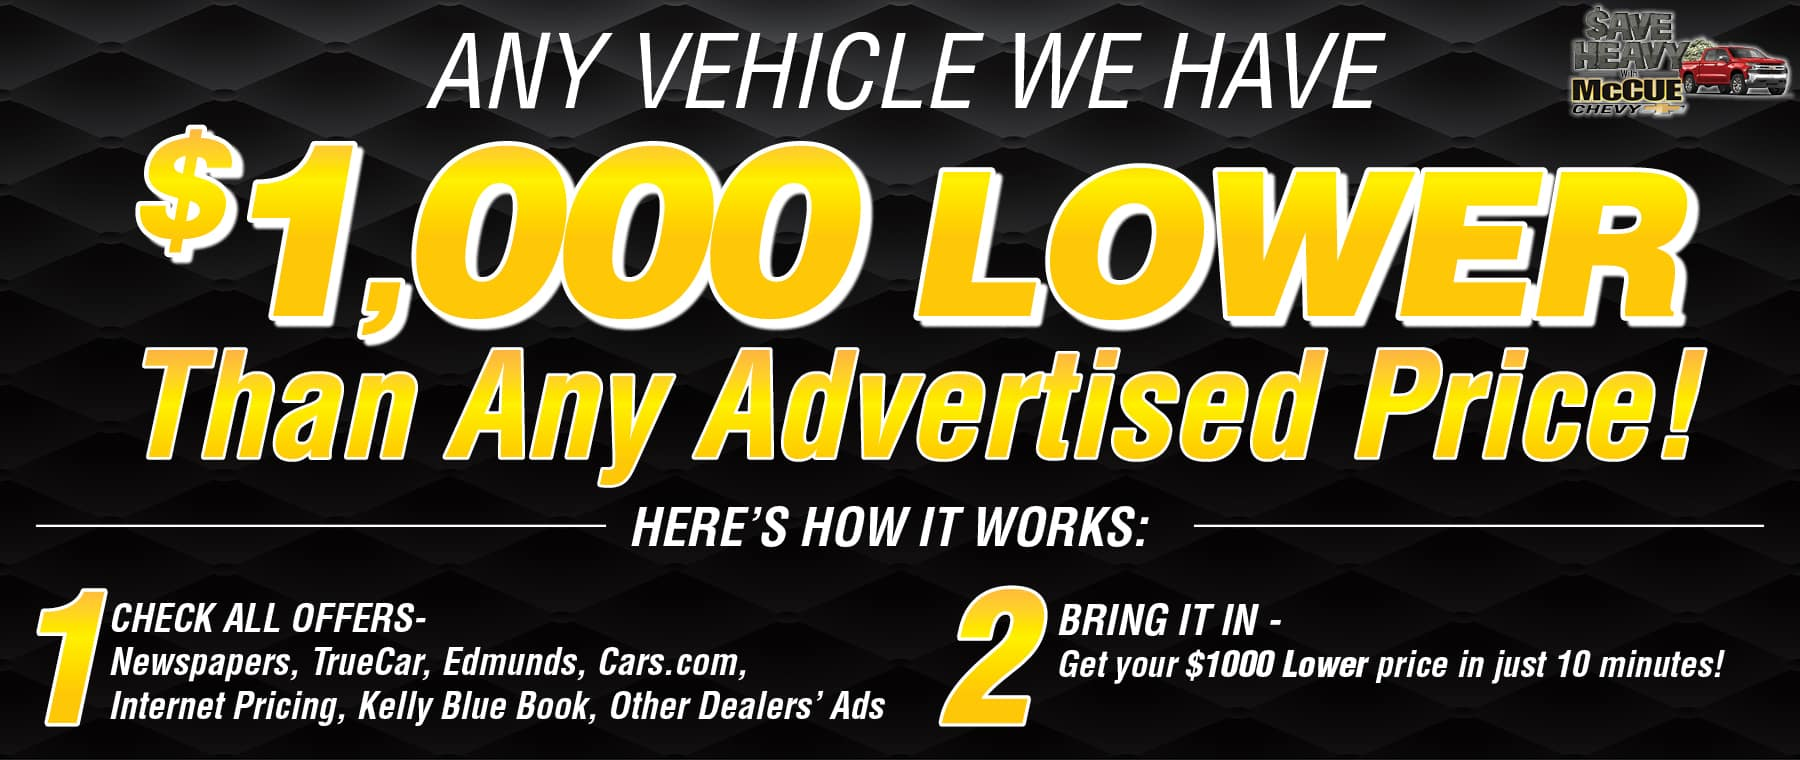 011921_MCCC_Buy Car_Homebanner_1800x760_